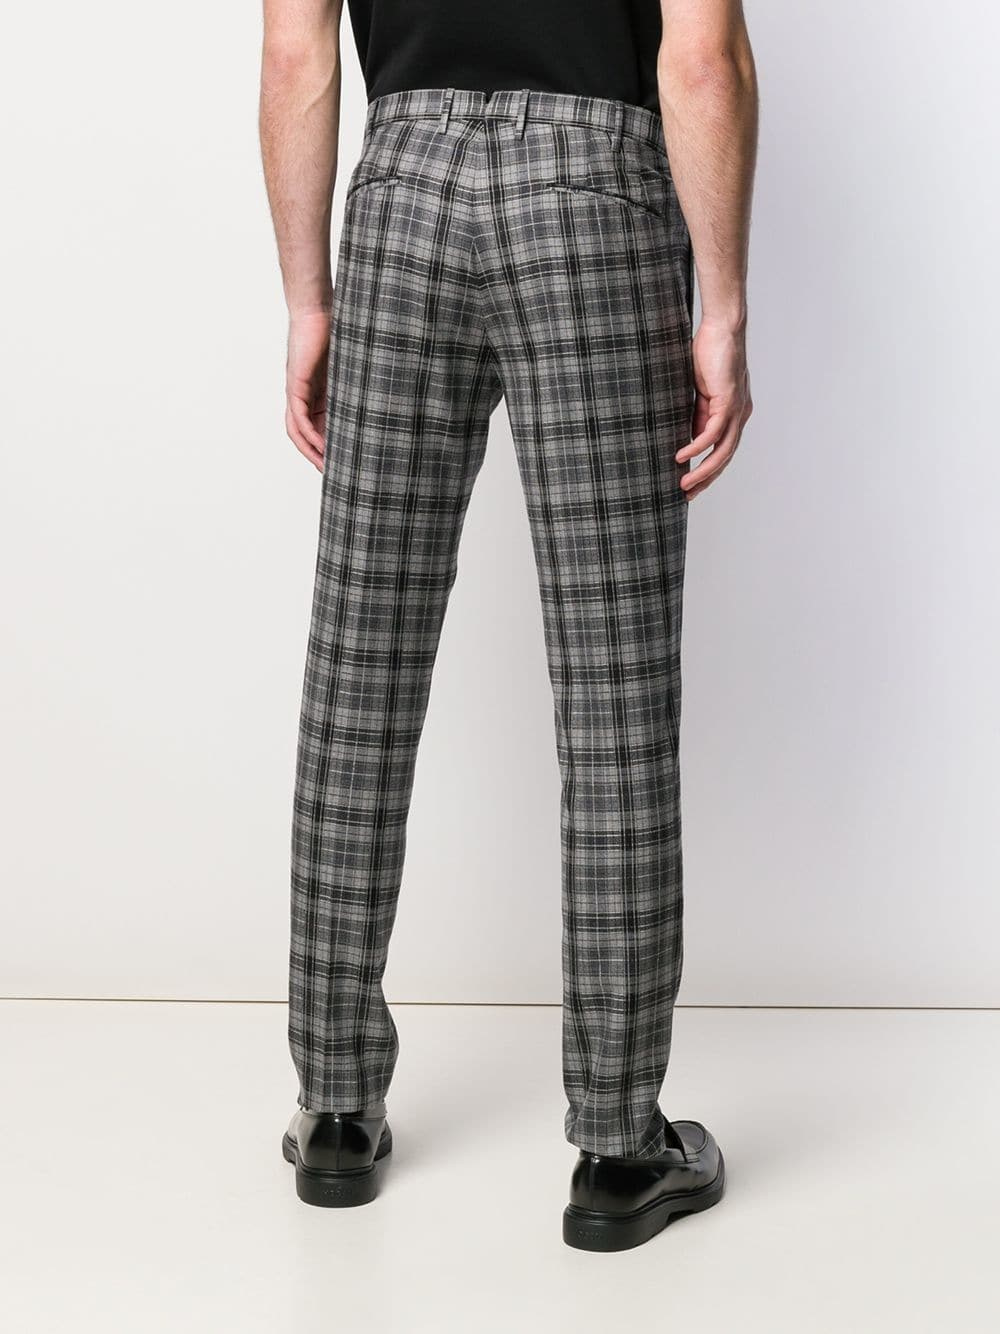 Penn Badgley style preppy fit trousers